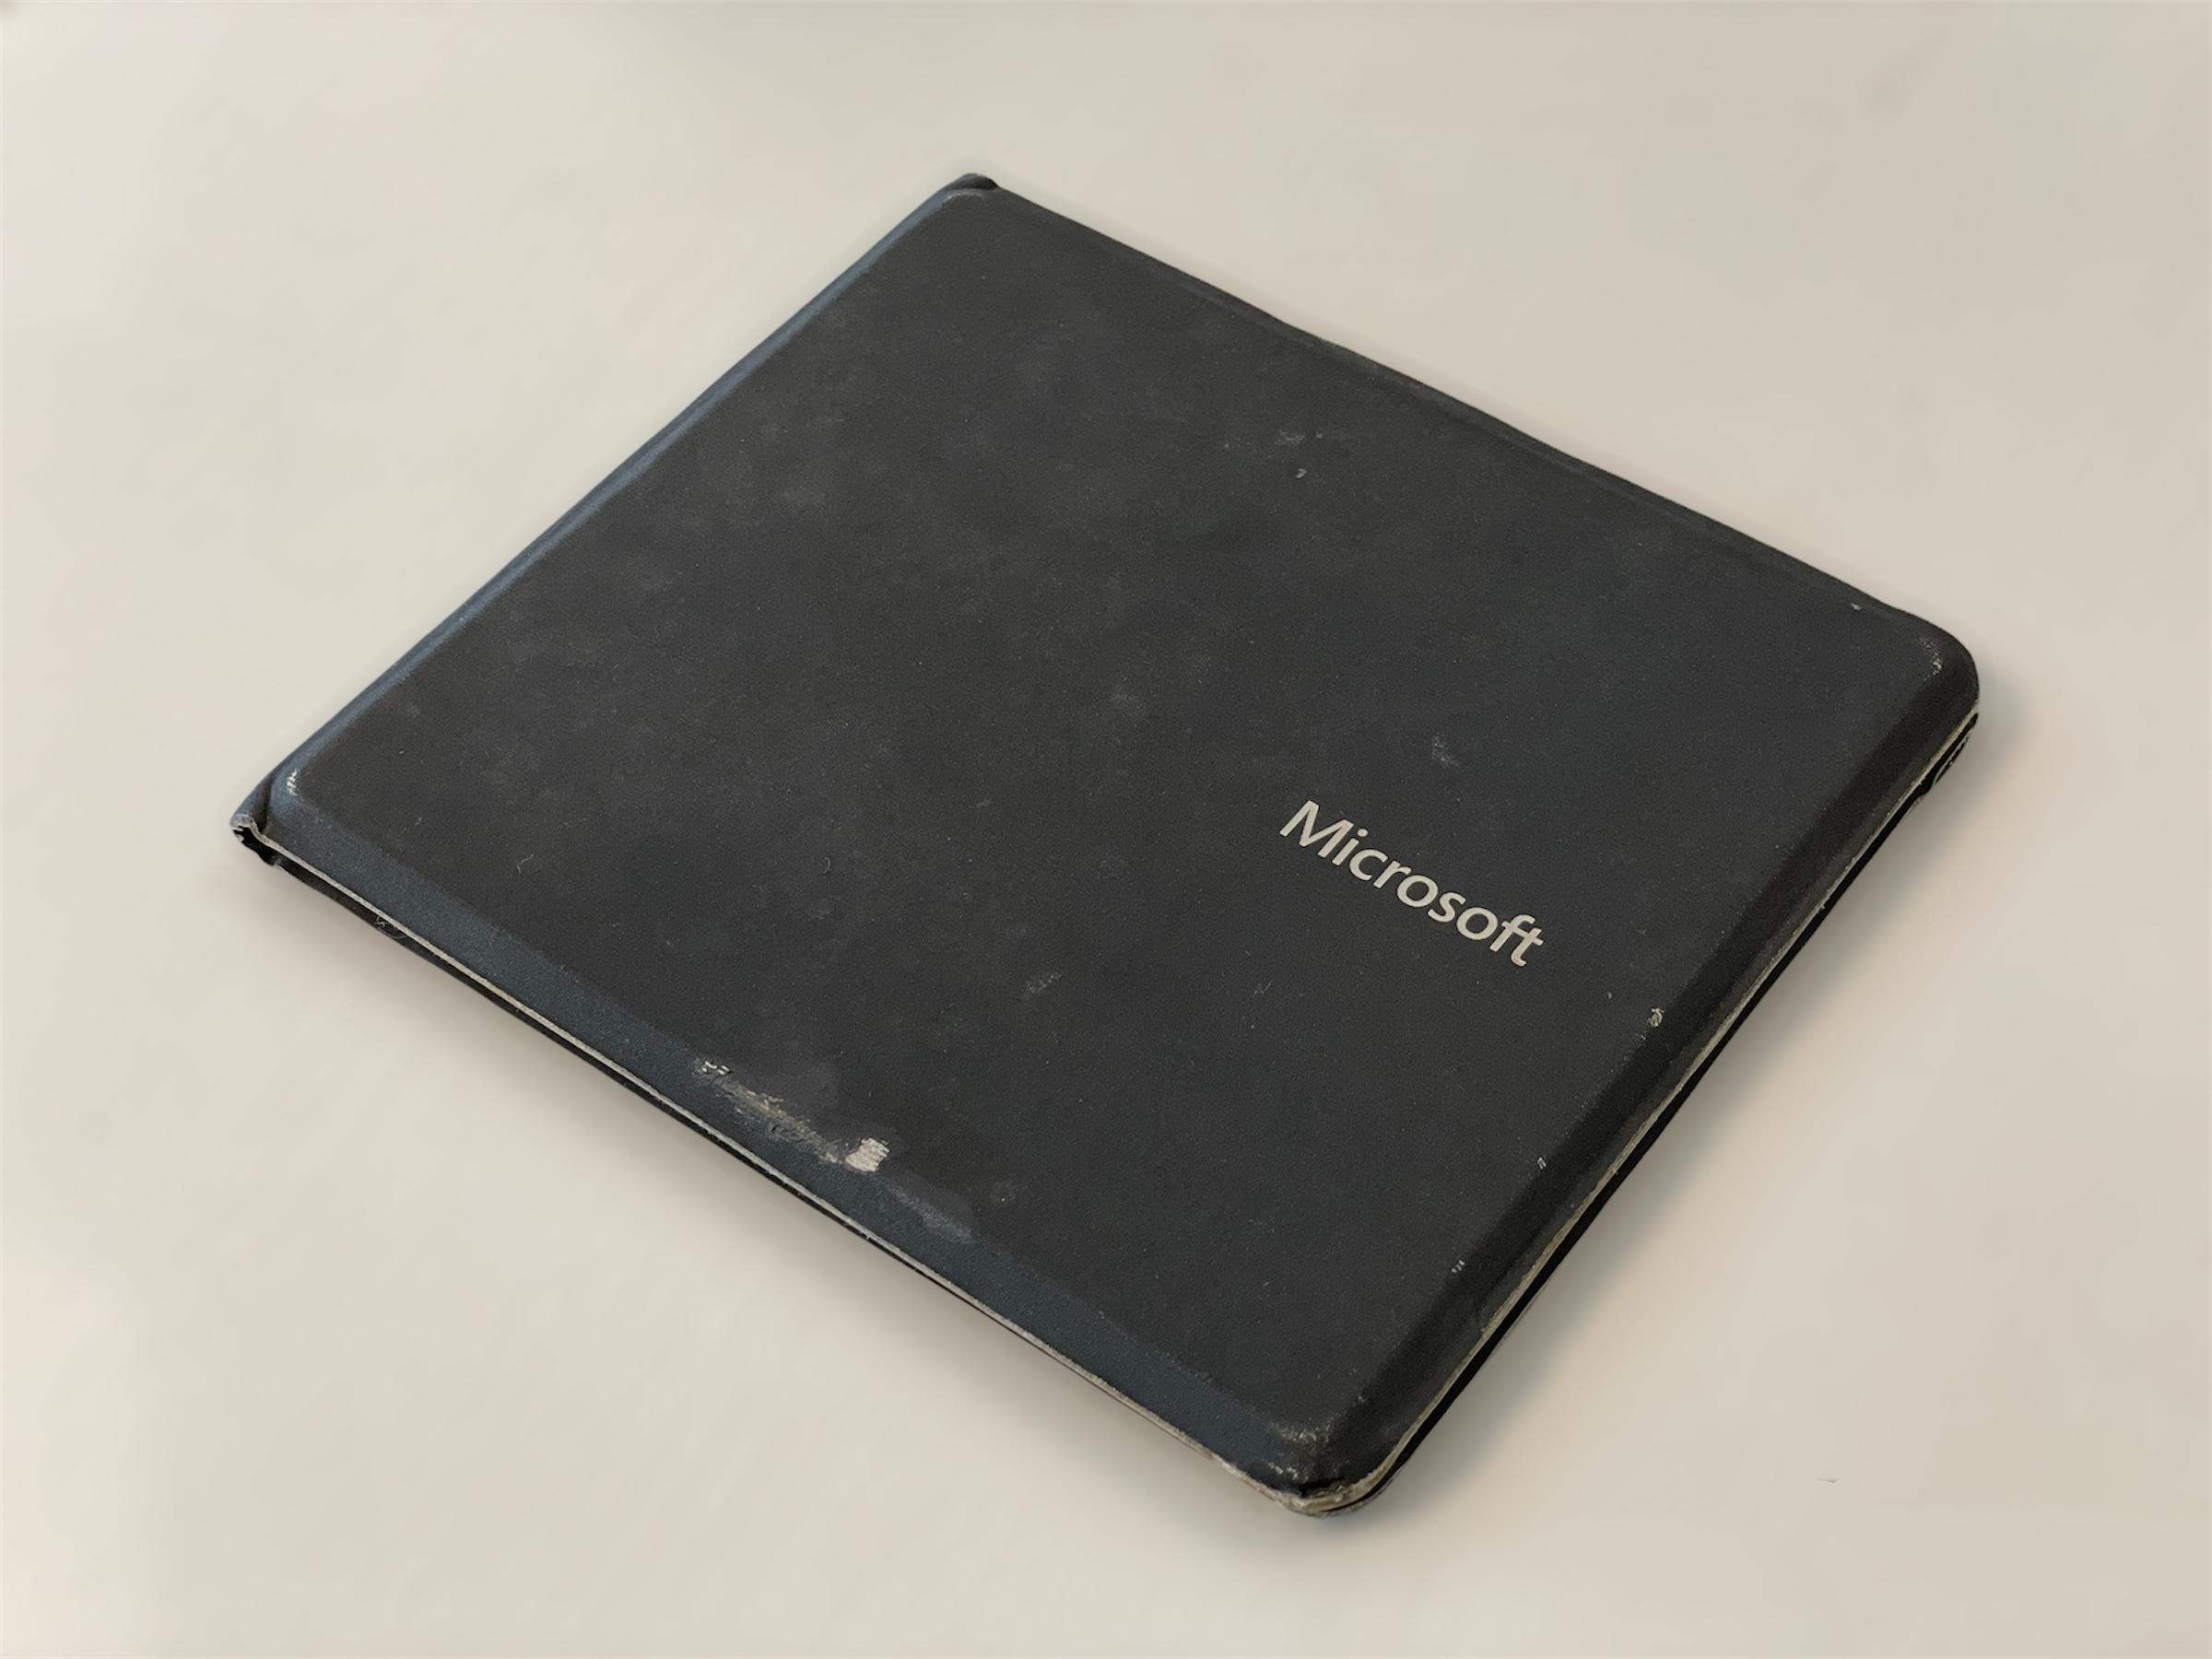 摺疊鍵盤 鍵盤 Microsoft Microsoft Universal Foldable Keyboard 打字 文字工作